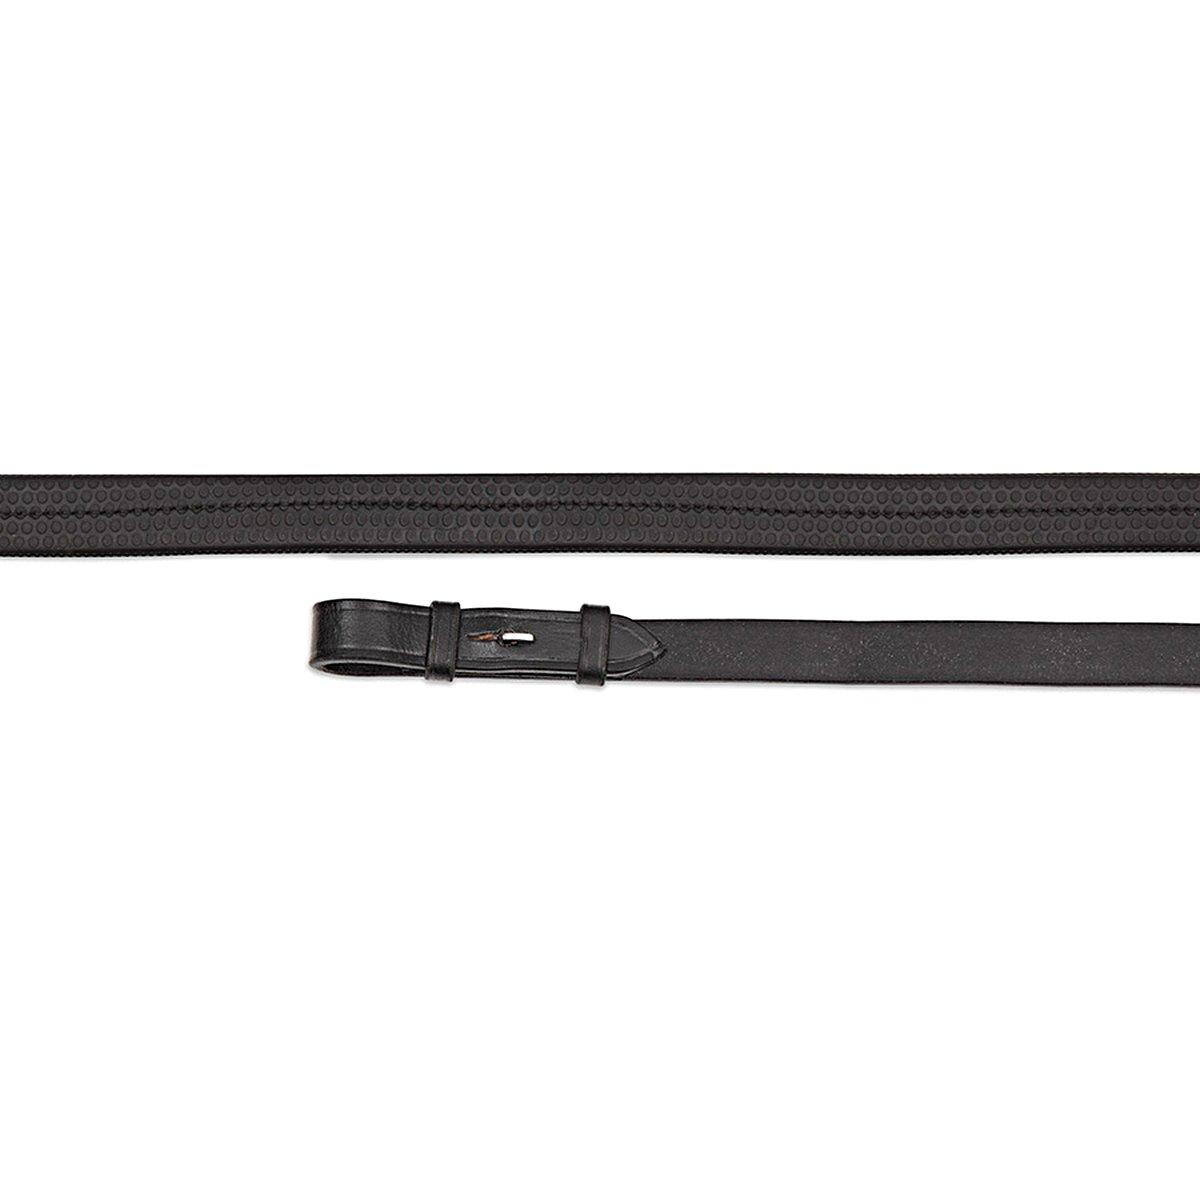 Imagem de Aviemore Reins Rubber Covered Black 135x1,5cm